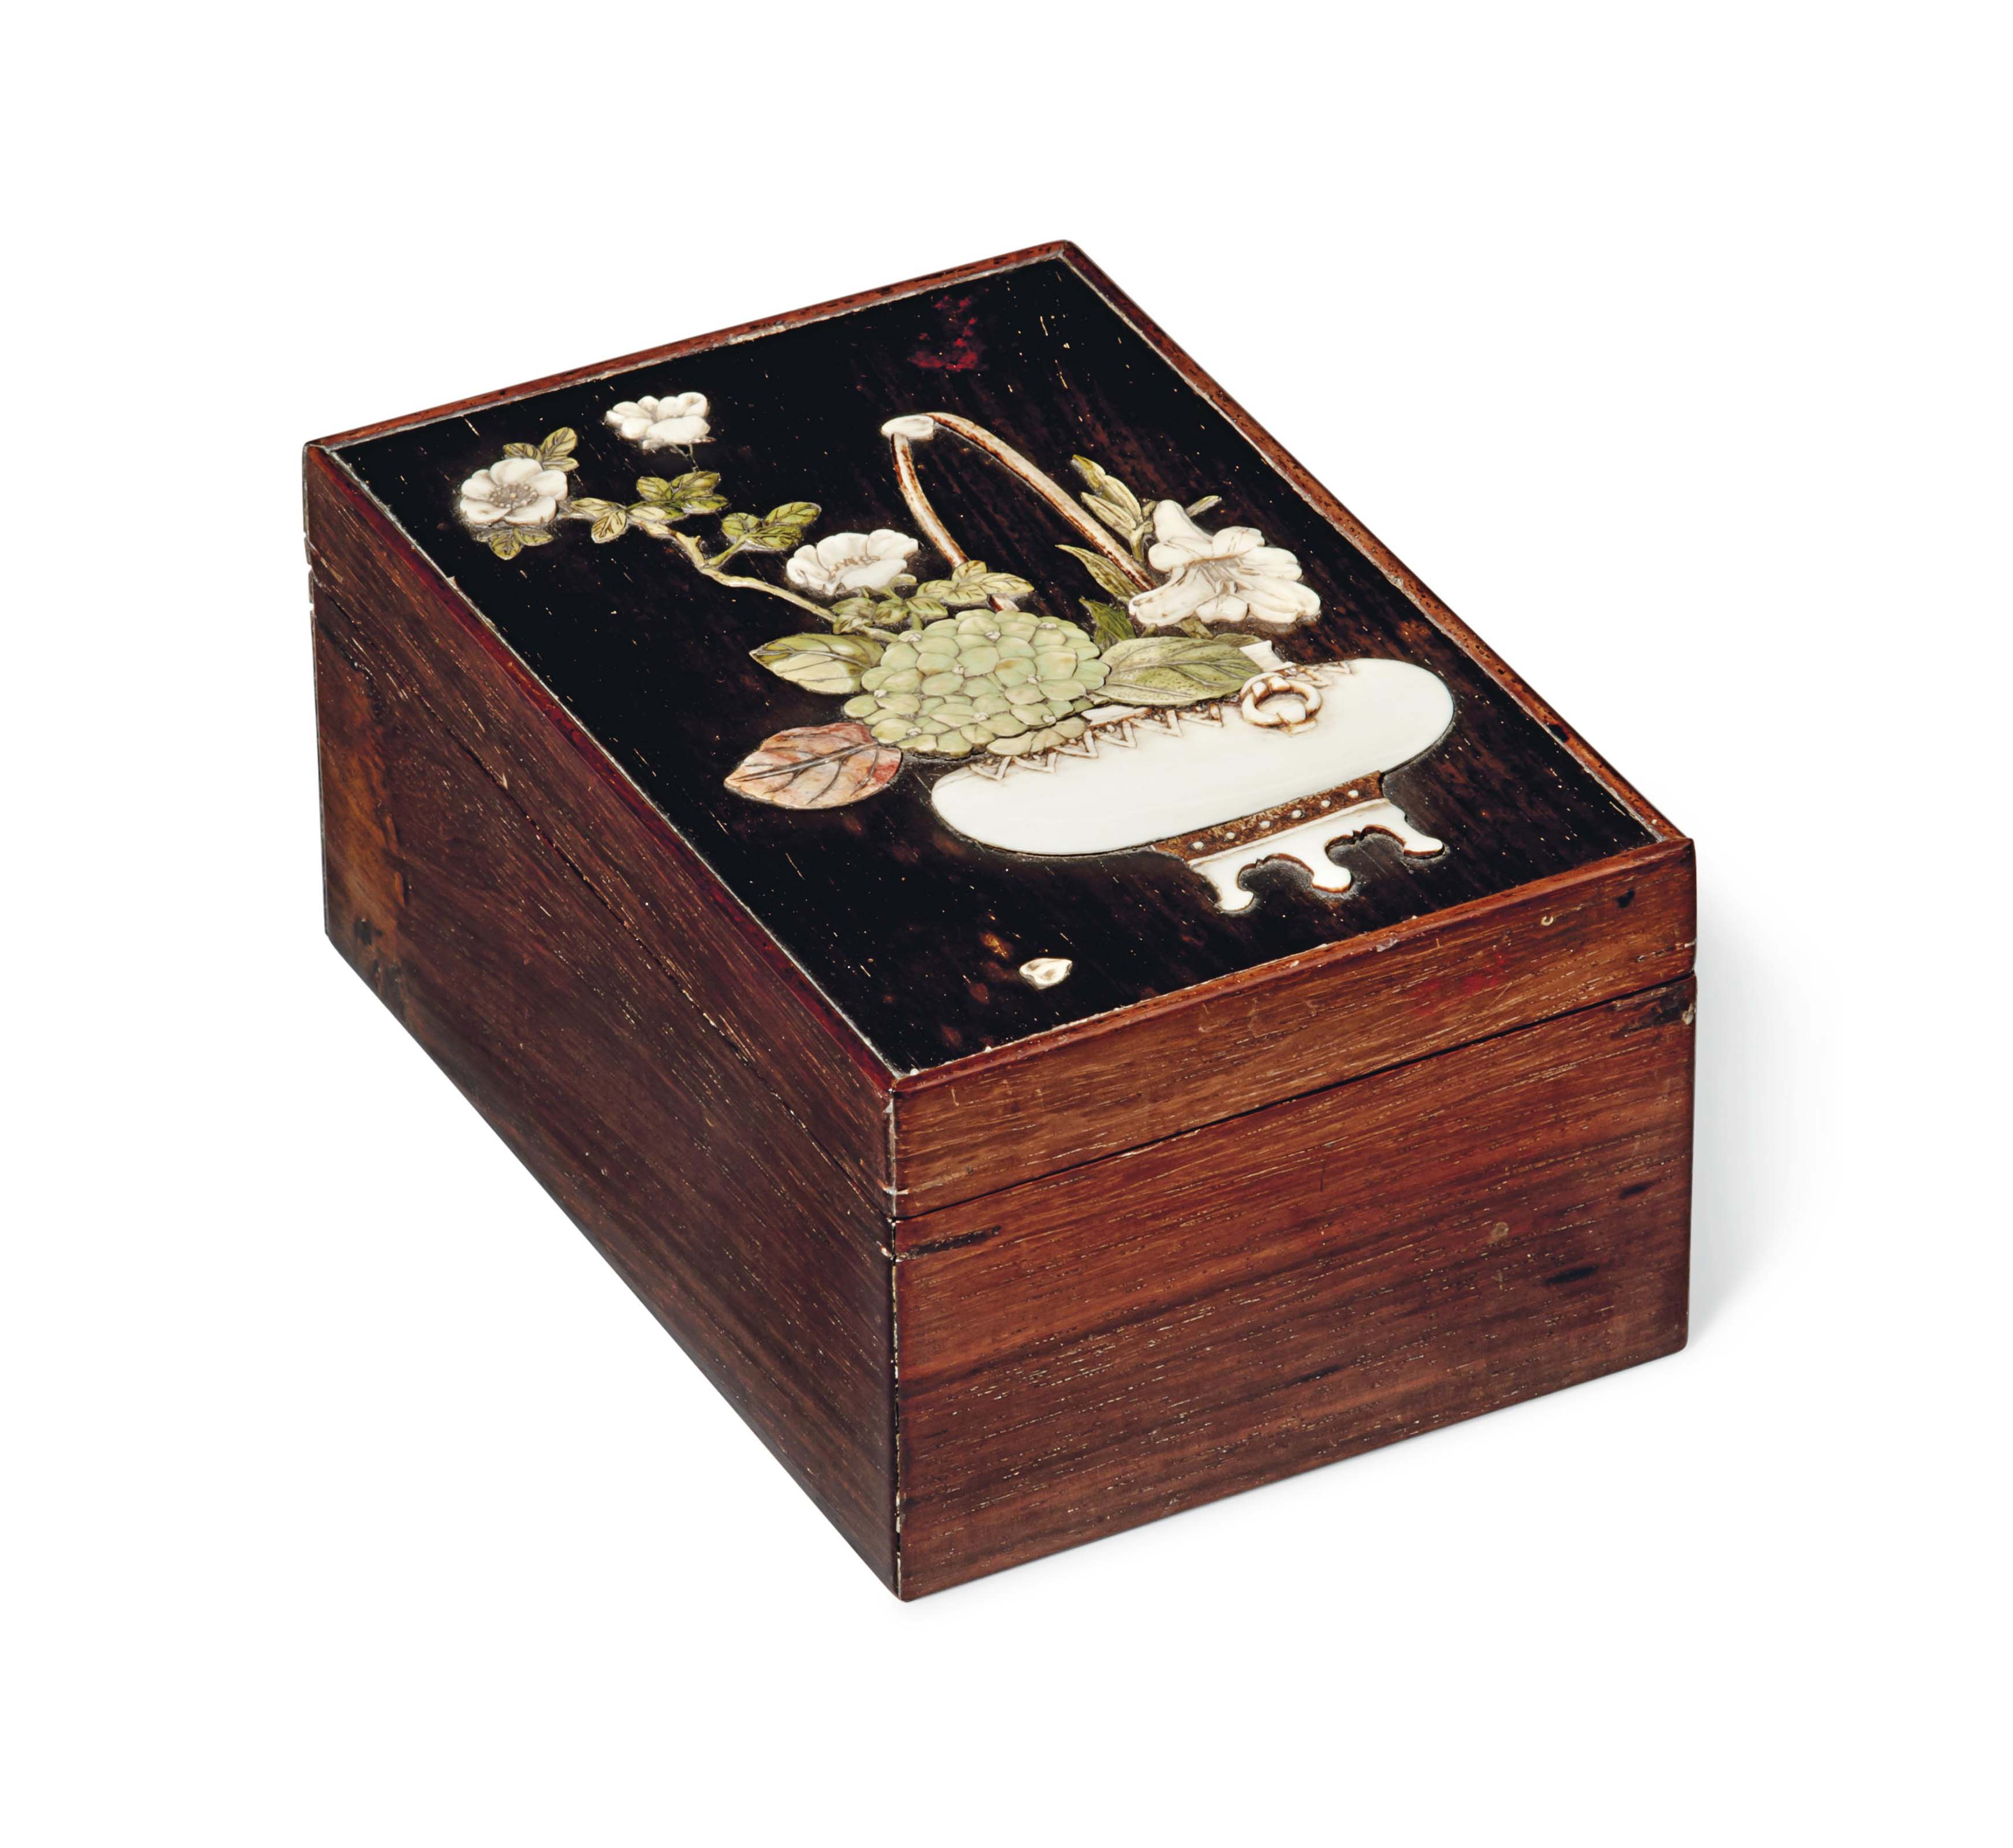 A Japanese Inlaid Wood Box